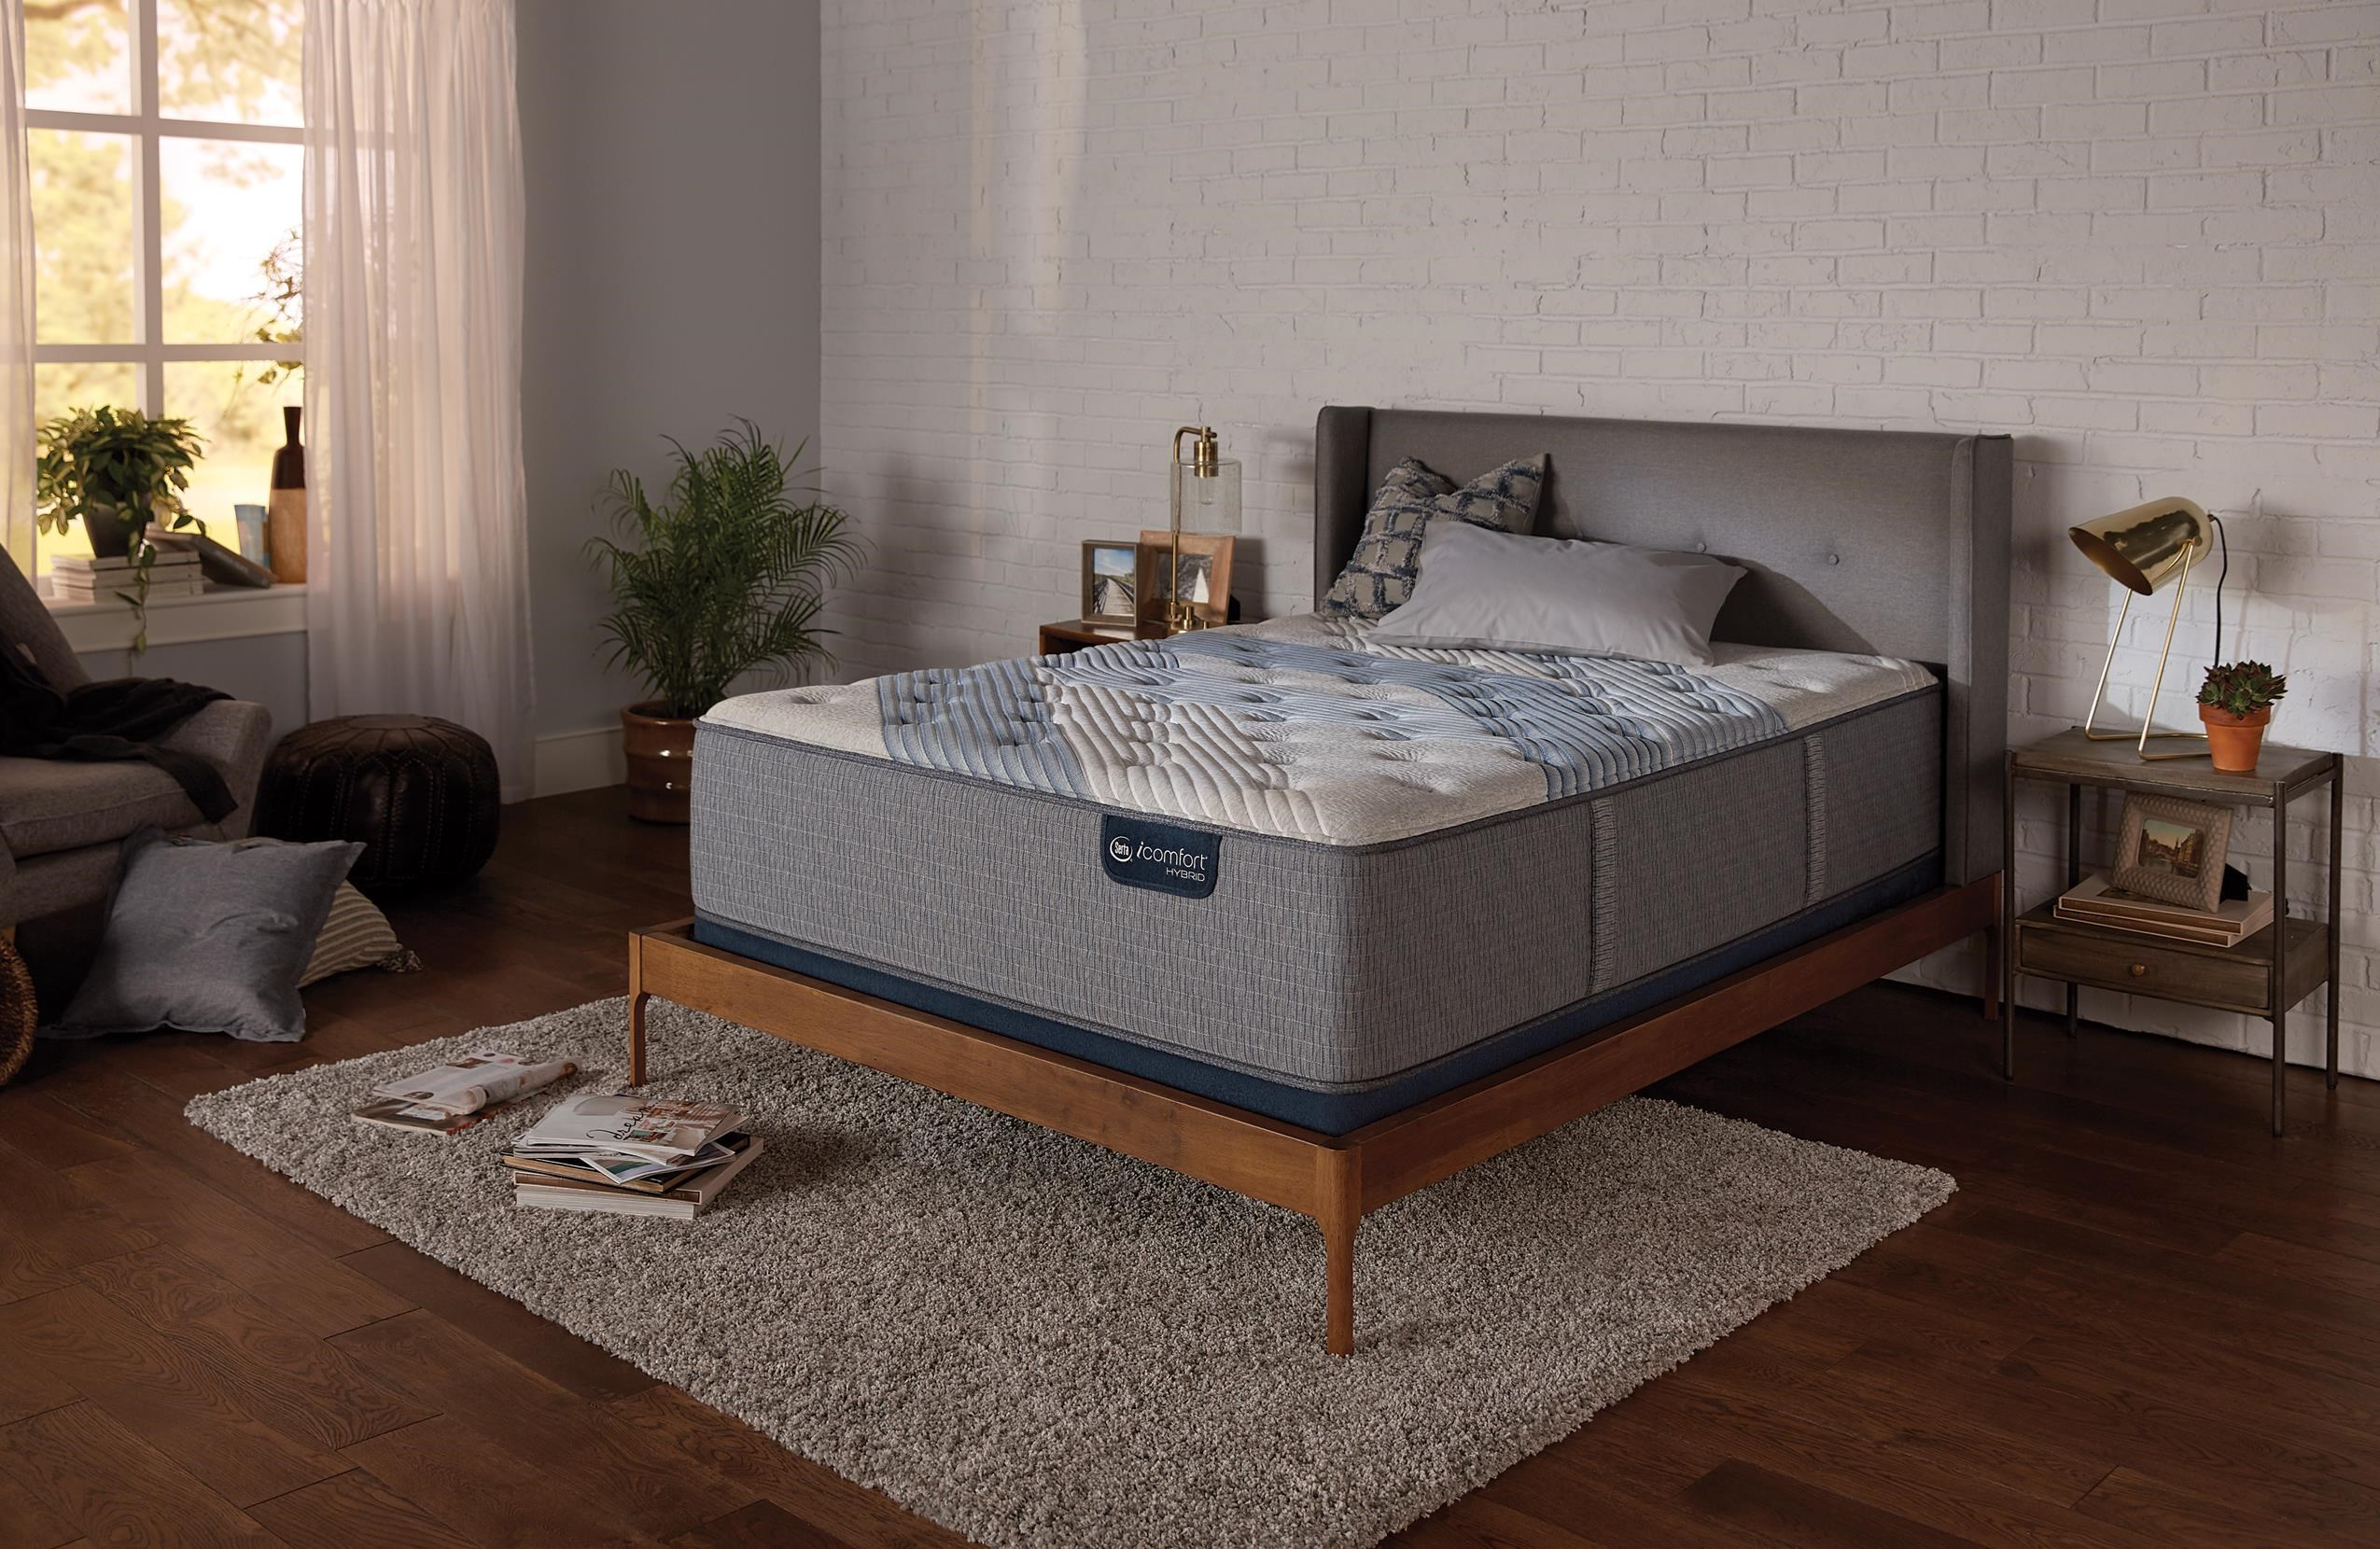 Queen iComfort BlueMax 1000 Cushion Firm